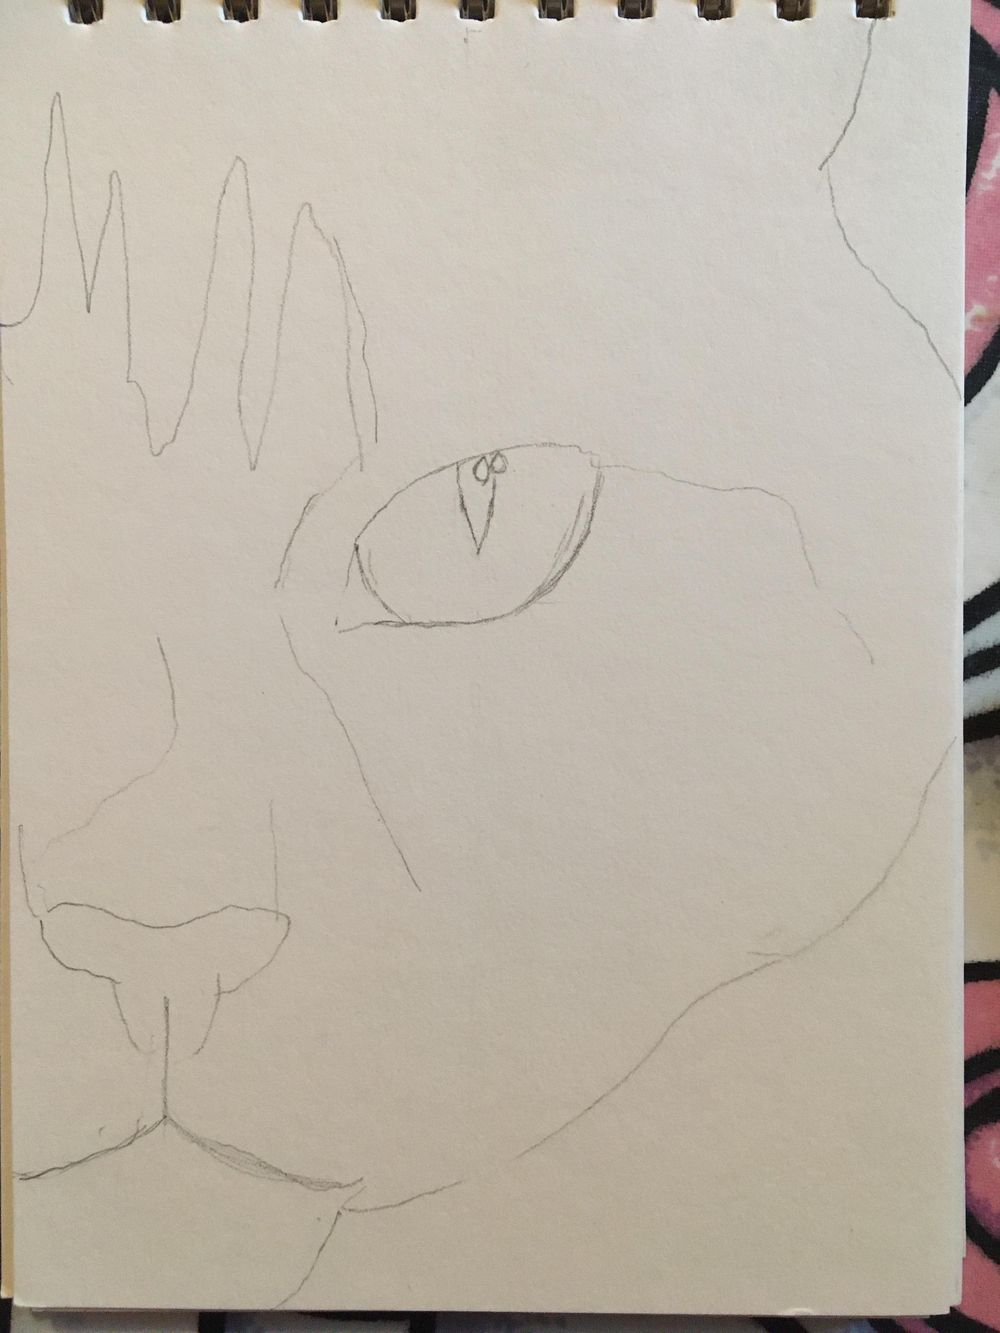 Kitten - image 1 - student project